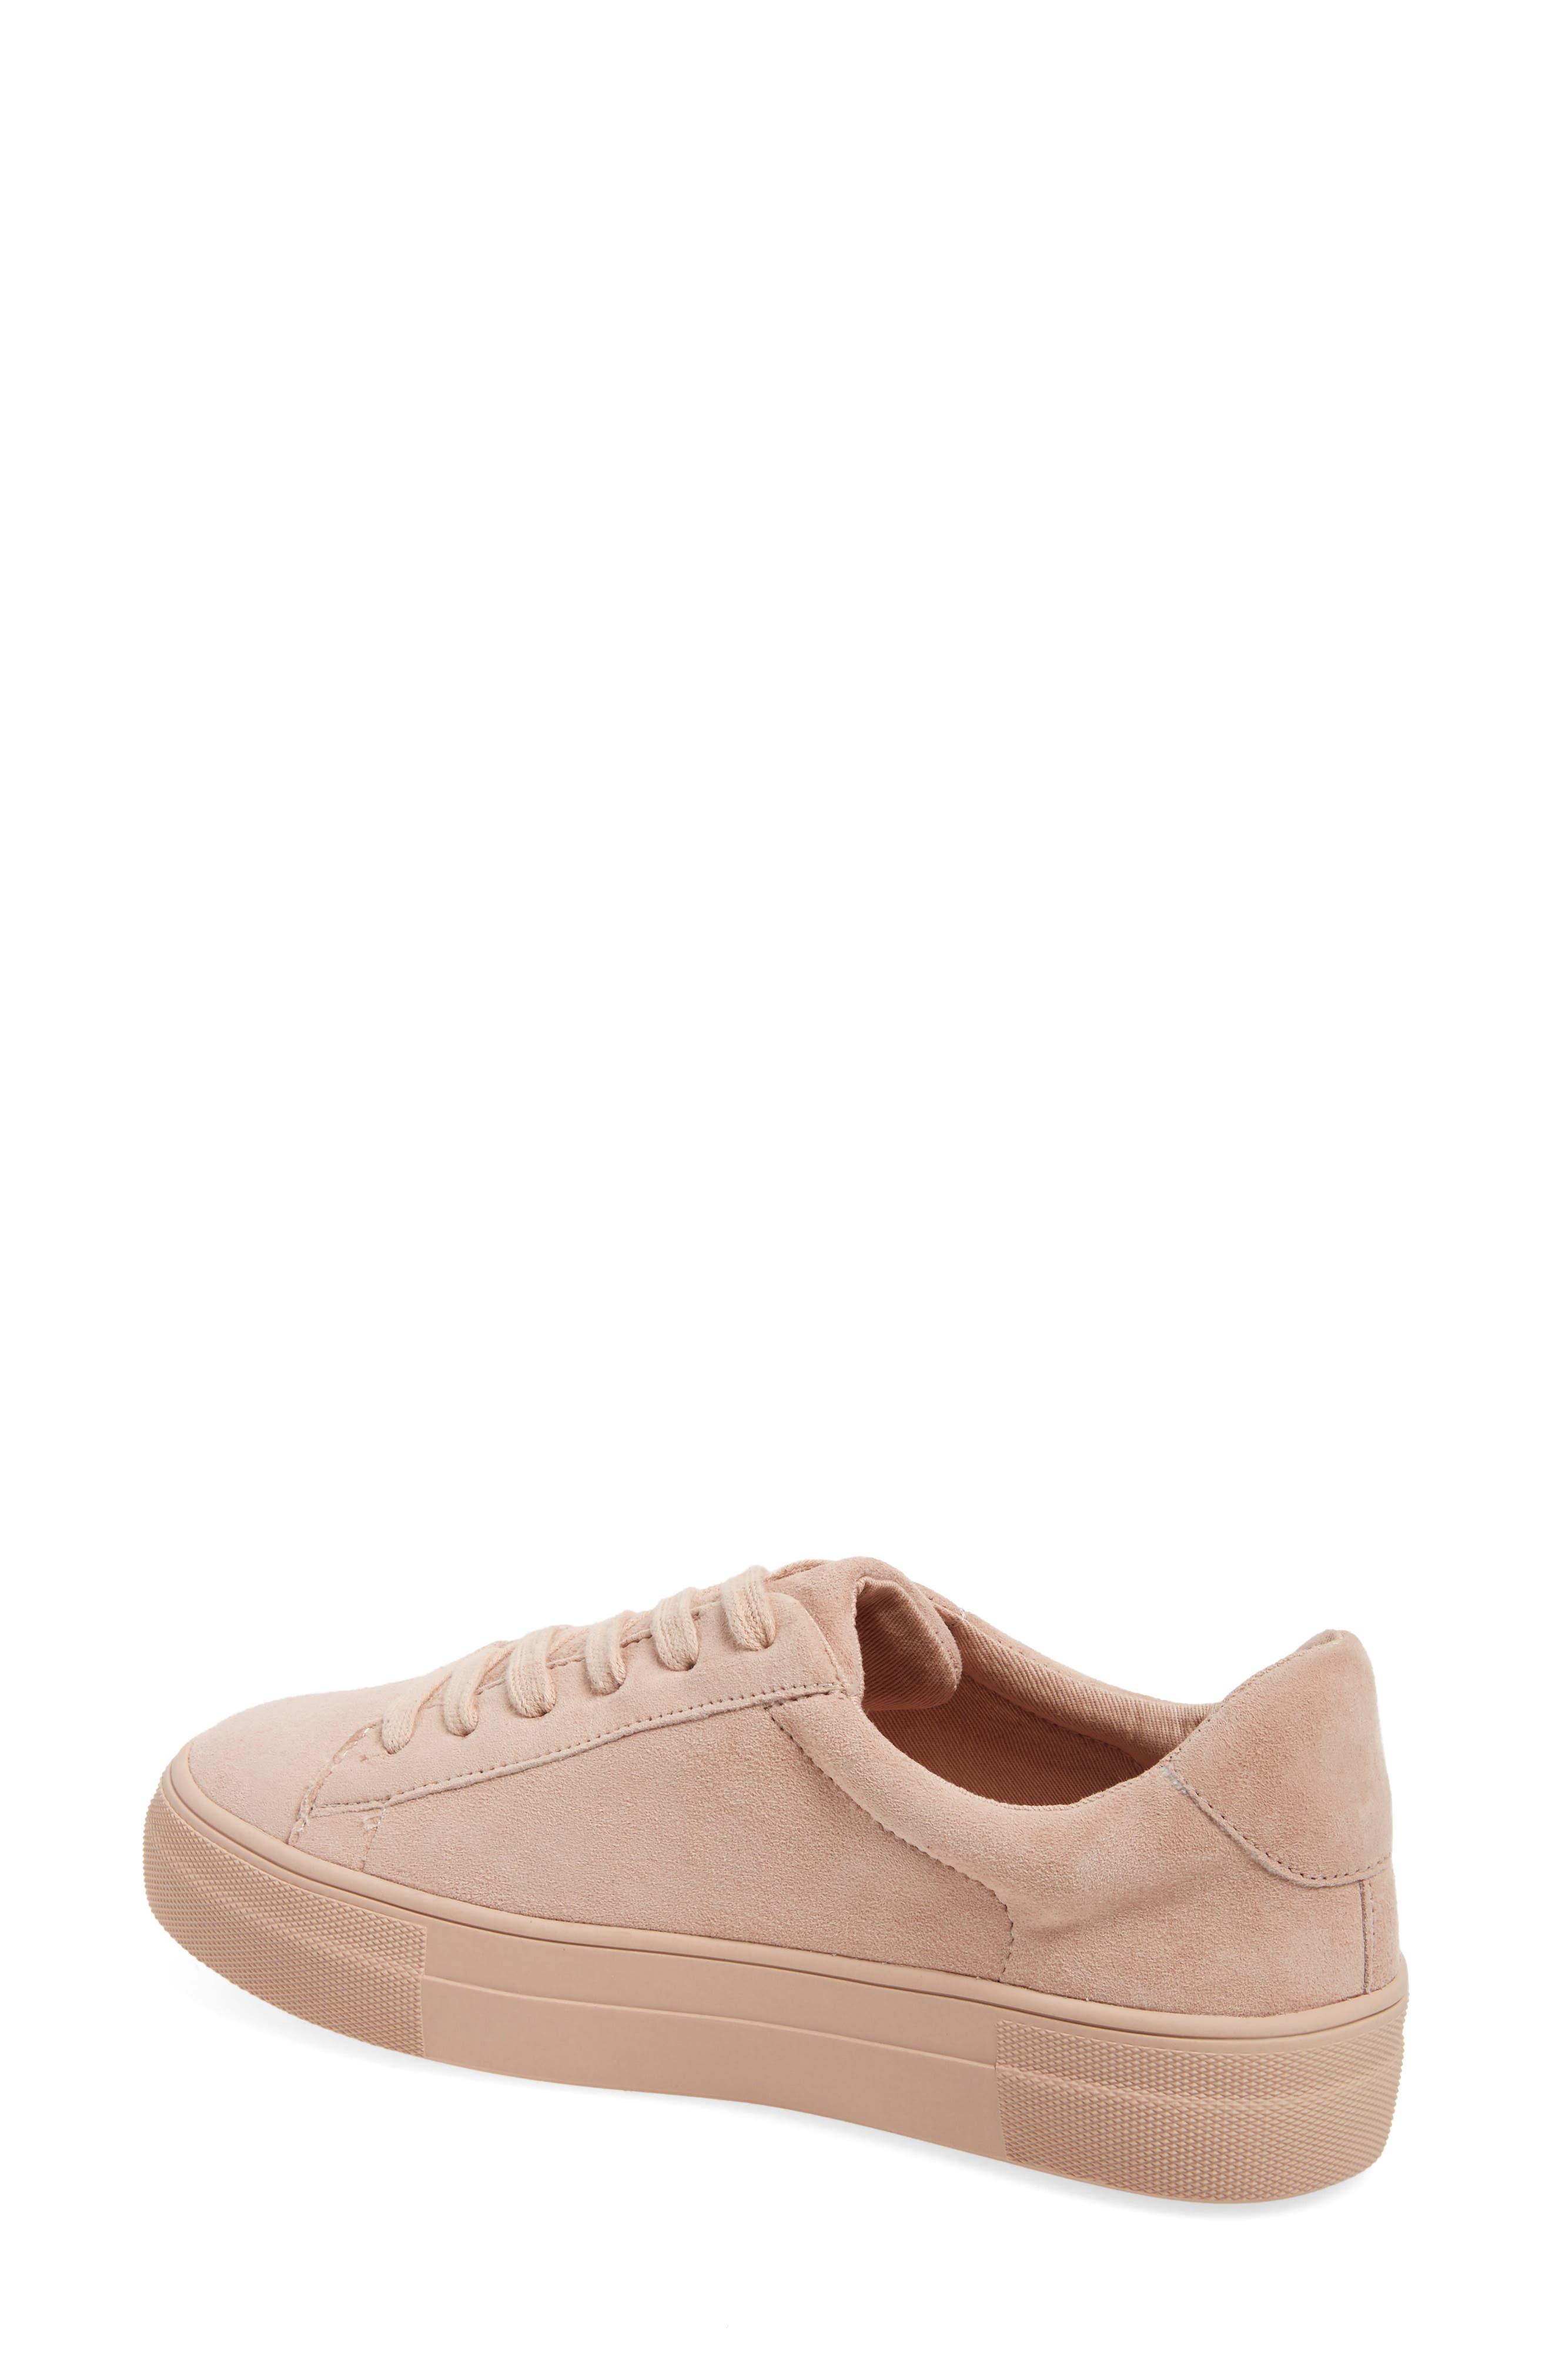 Gisela Low Top Sneaker,                             Alternate thumbnail 6, color,